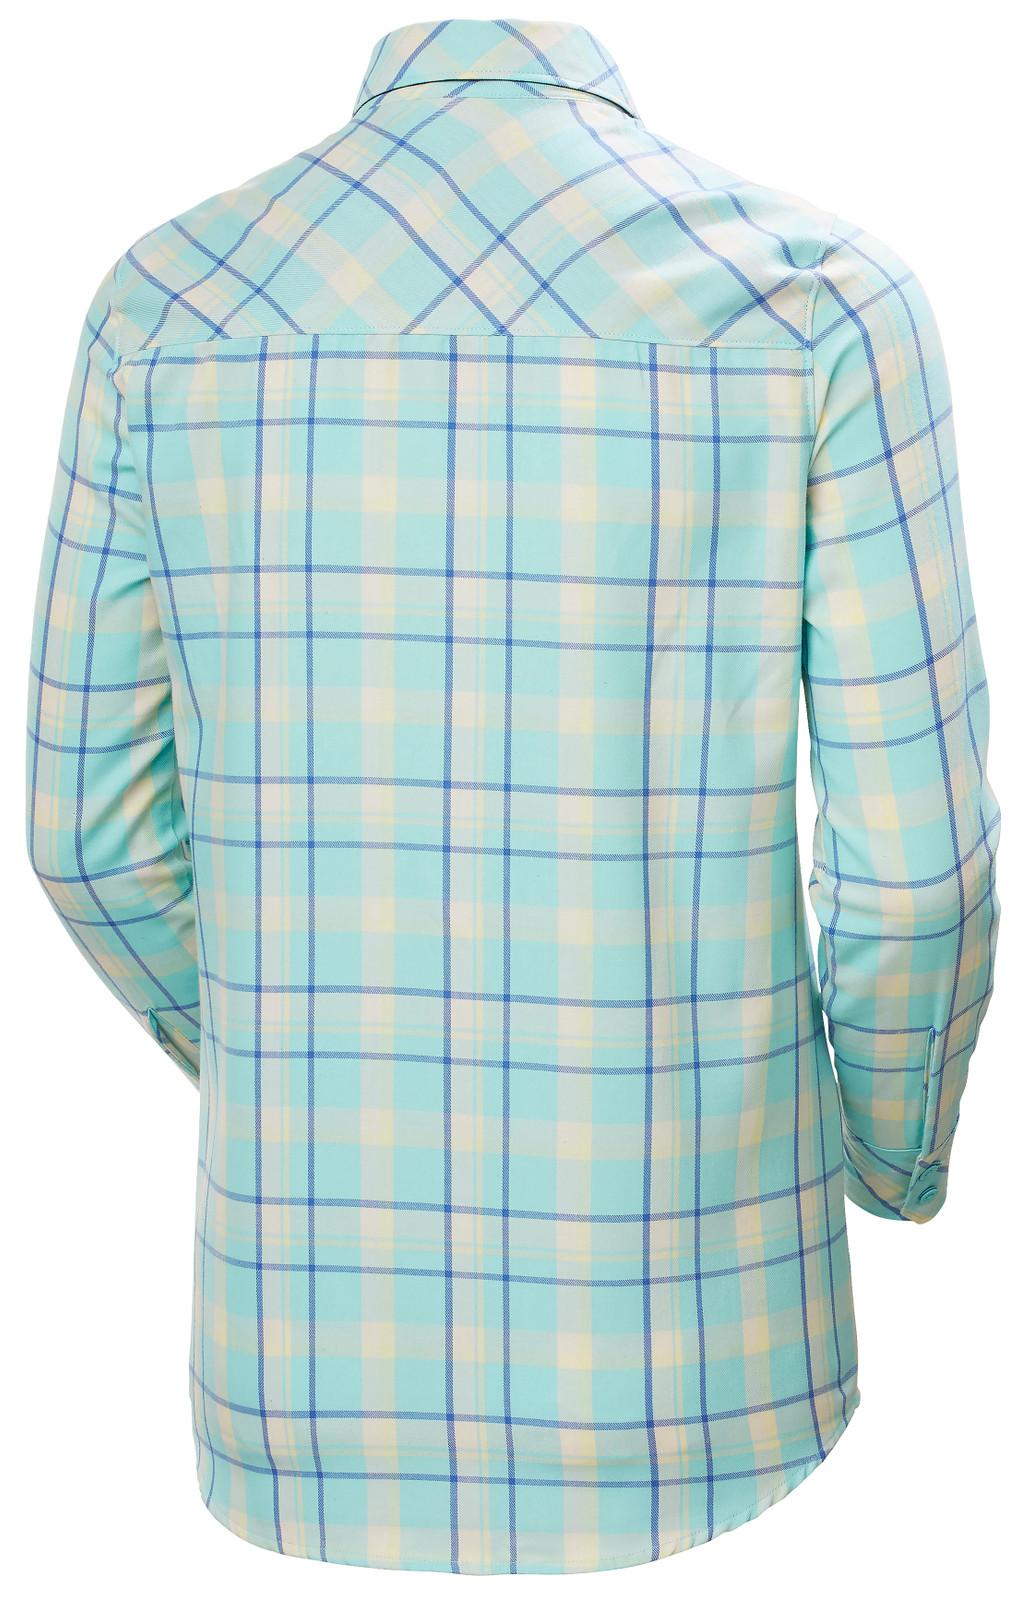 Helly Hansen Lokka LS Shirt, Women's - Glacier Blue, 62875-648 back